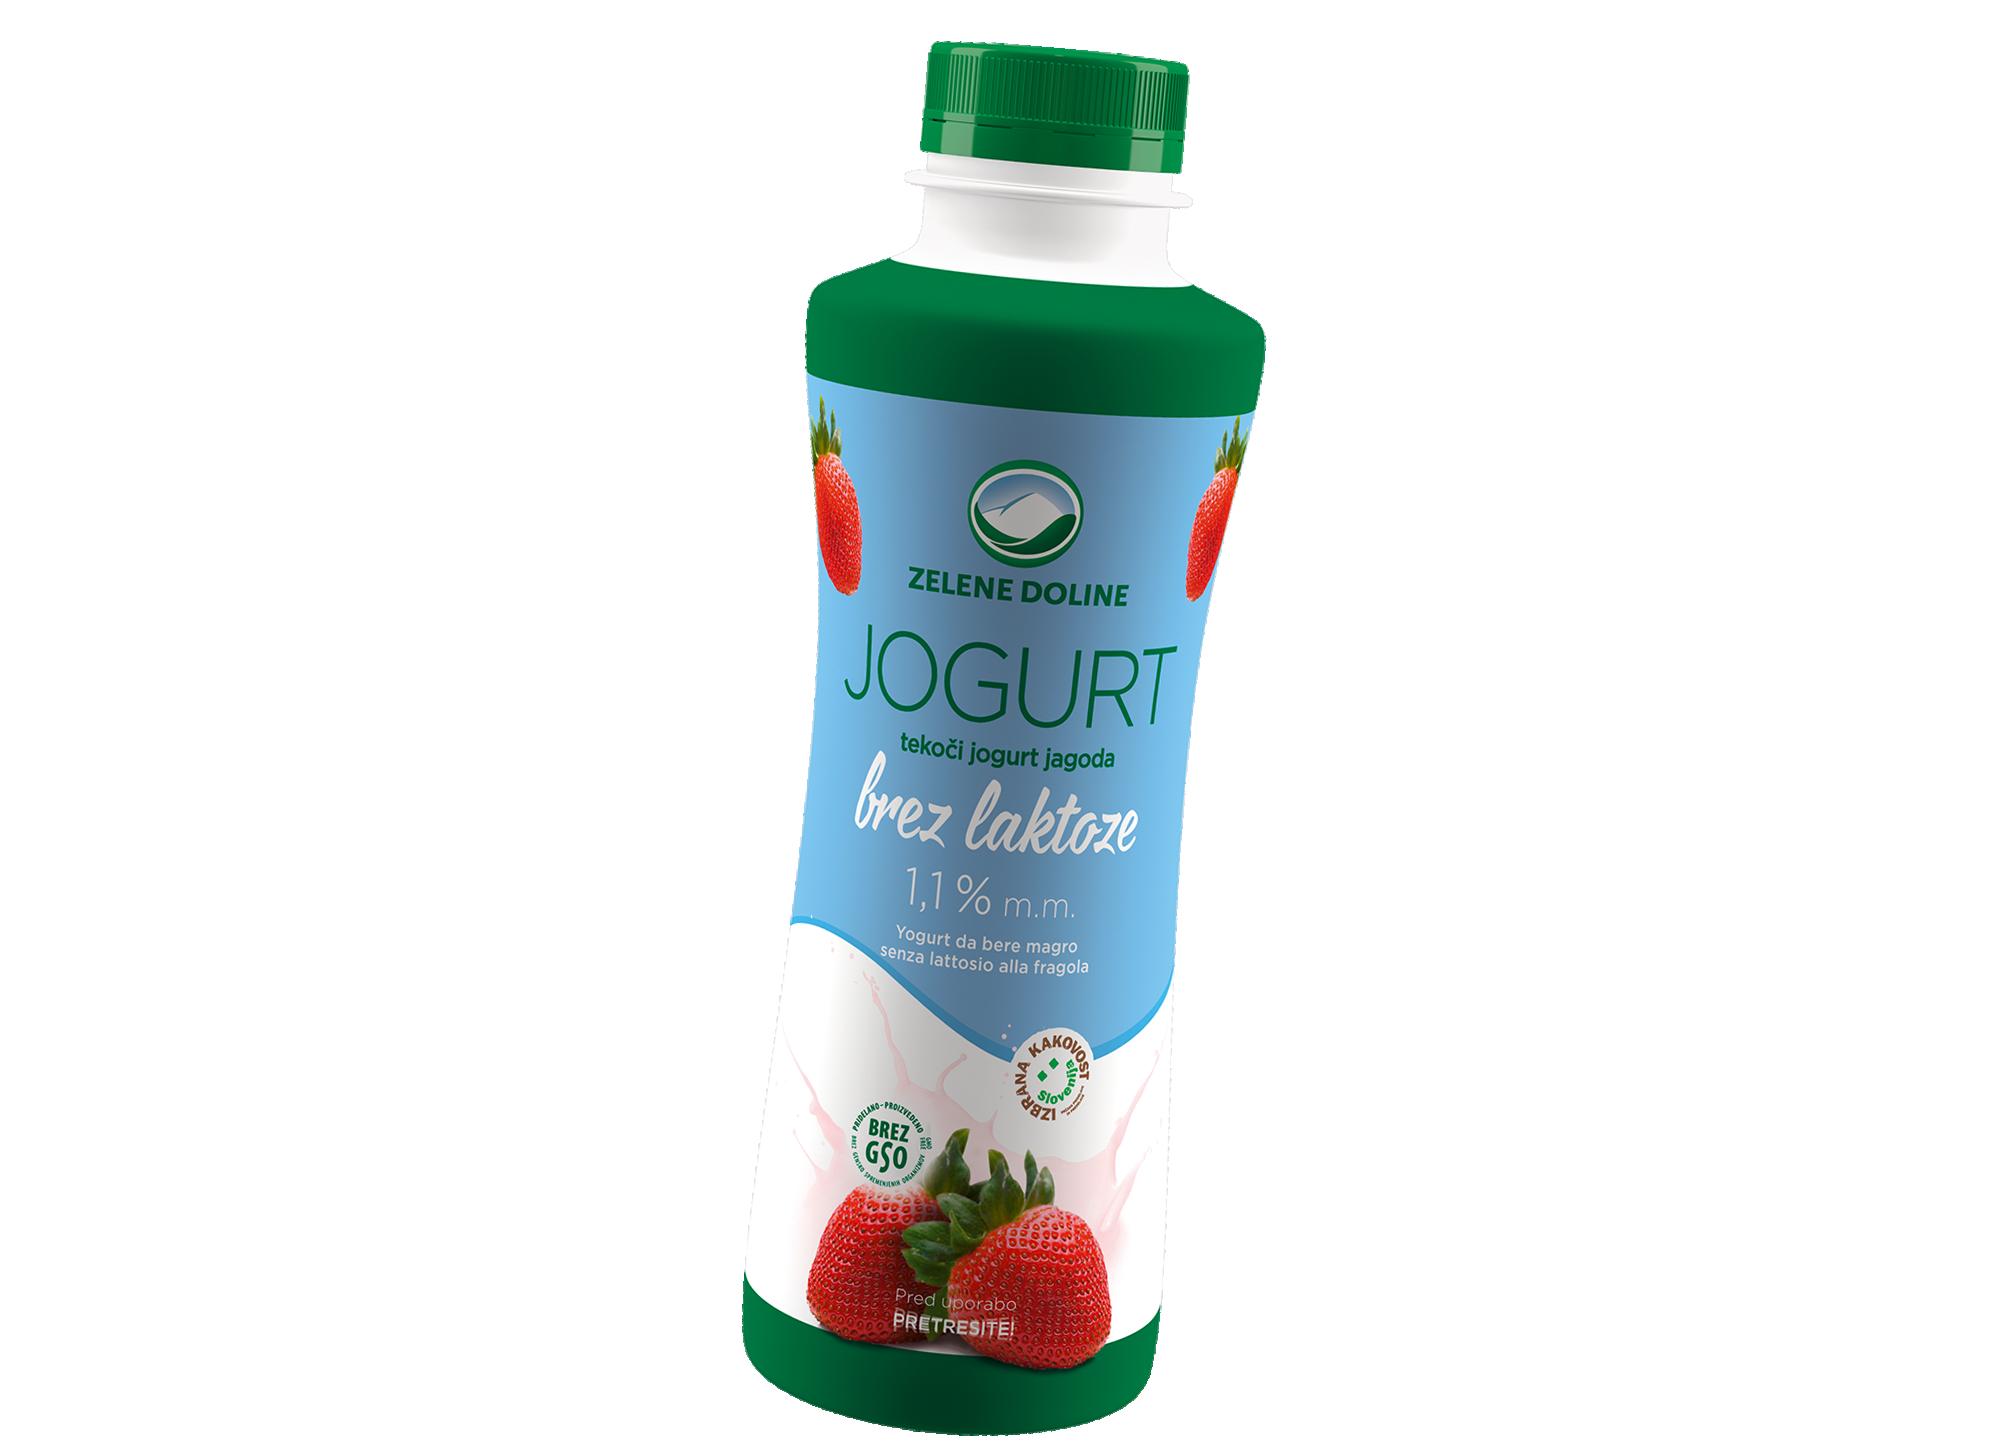 Brezlaktozni jogurt